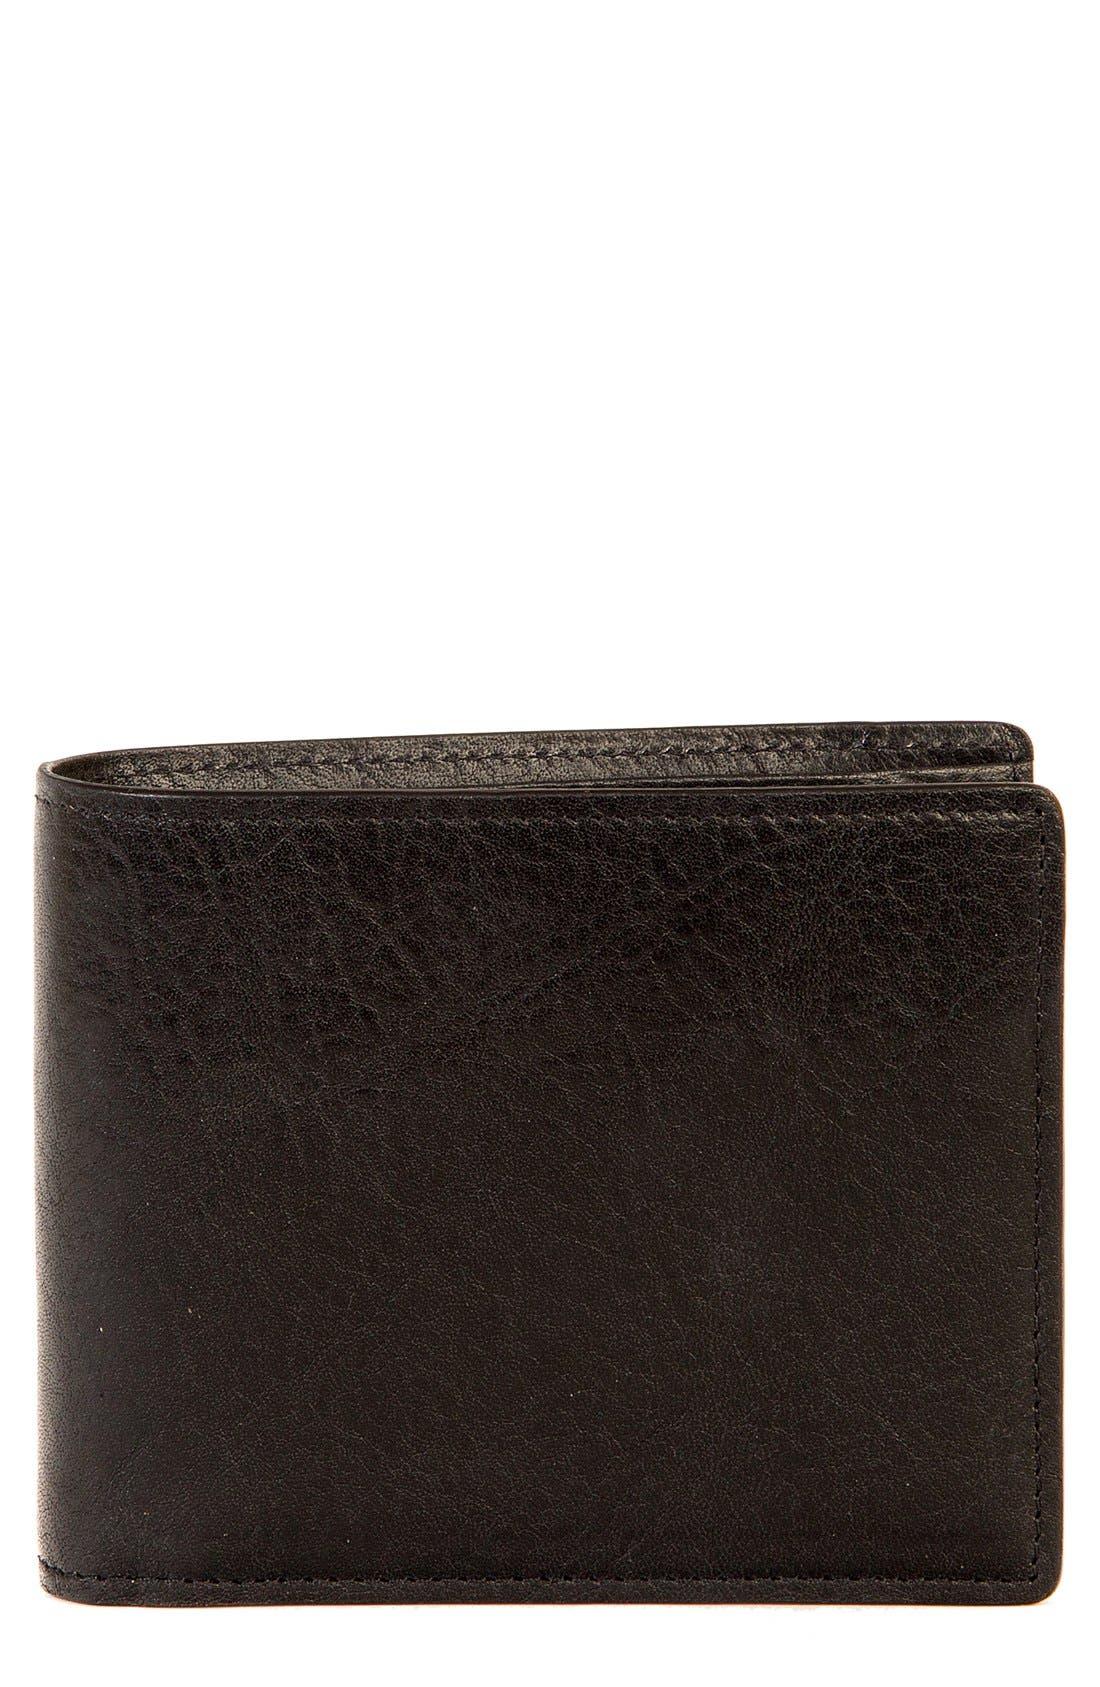 Boconi 'Becker' RFID Leather Wallet